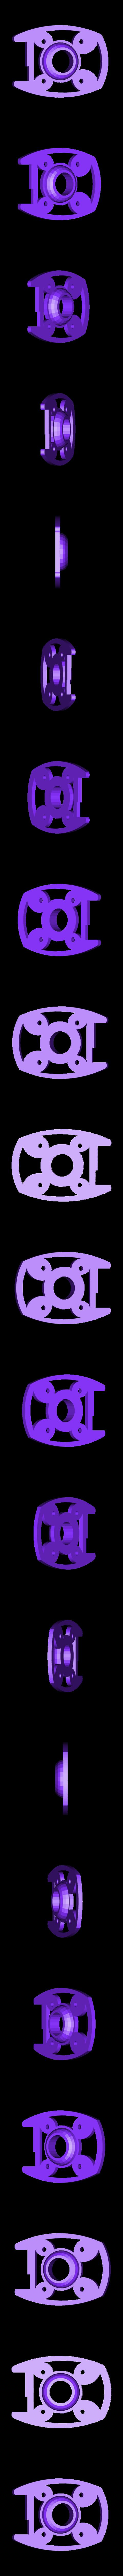 Mini_racer_Brushless_0806_Top_Plate_2S_.stl Download free STL file Mini Quad Racer 100mm Brushless GemFan 0806 6200kv 2S • 3D printer model, Microdure